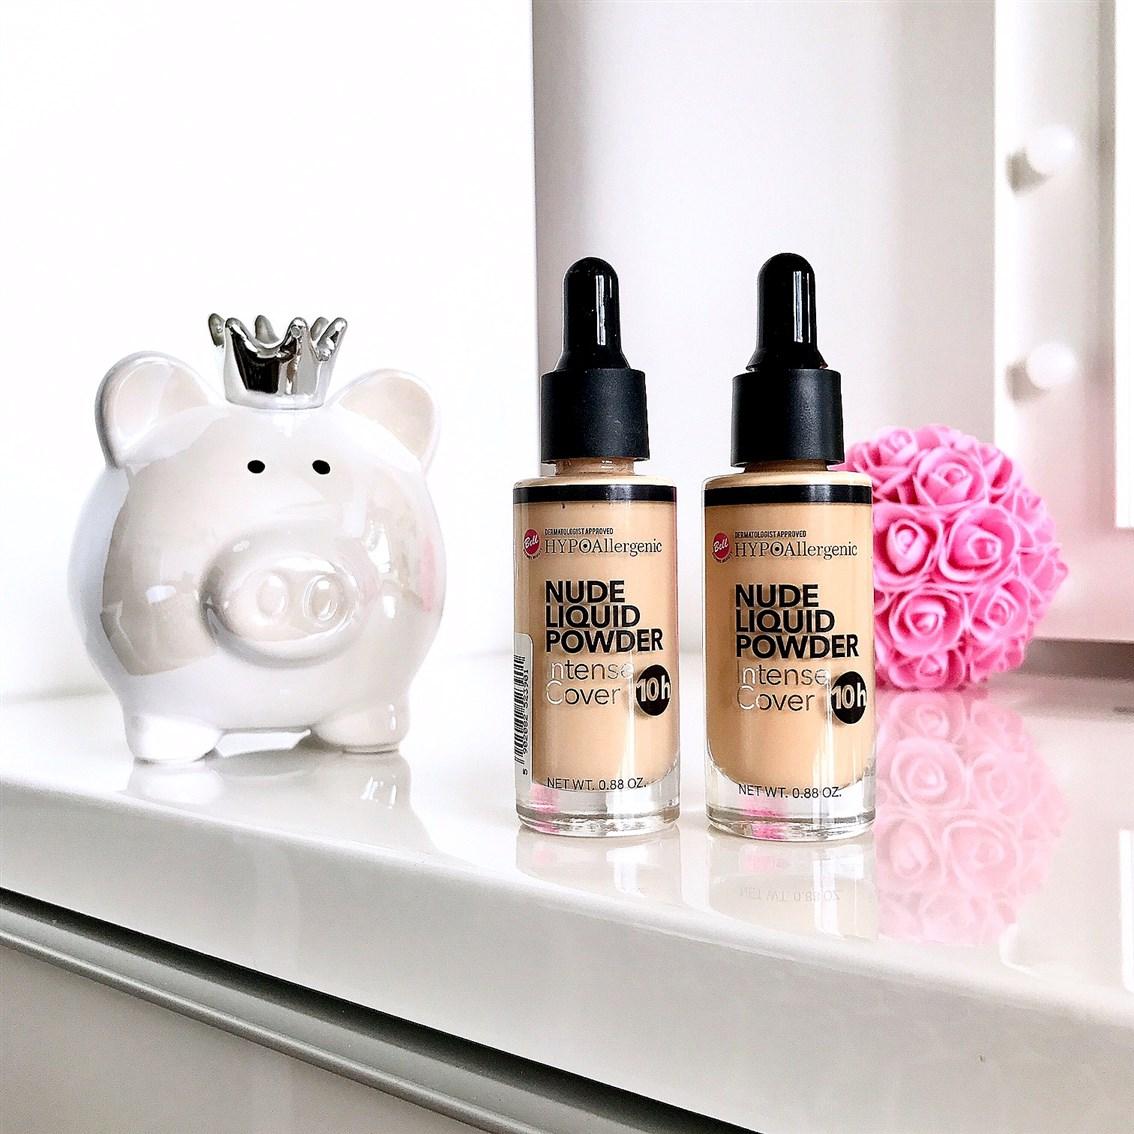 podkład Bell Nude Liquid Powder